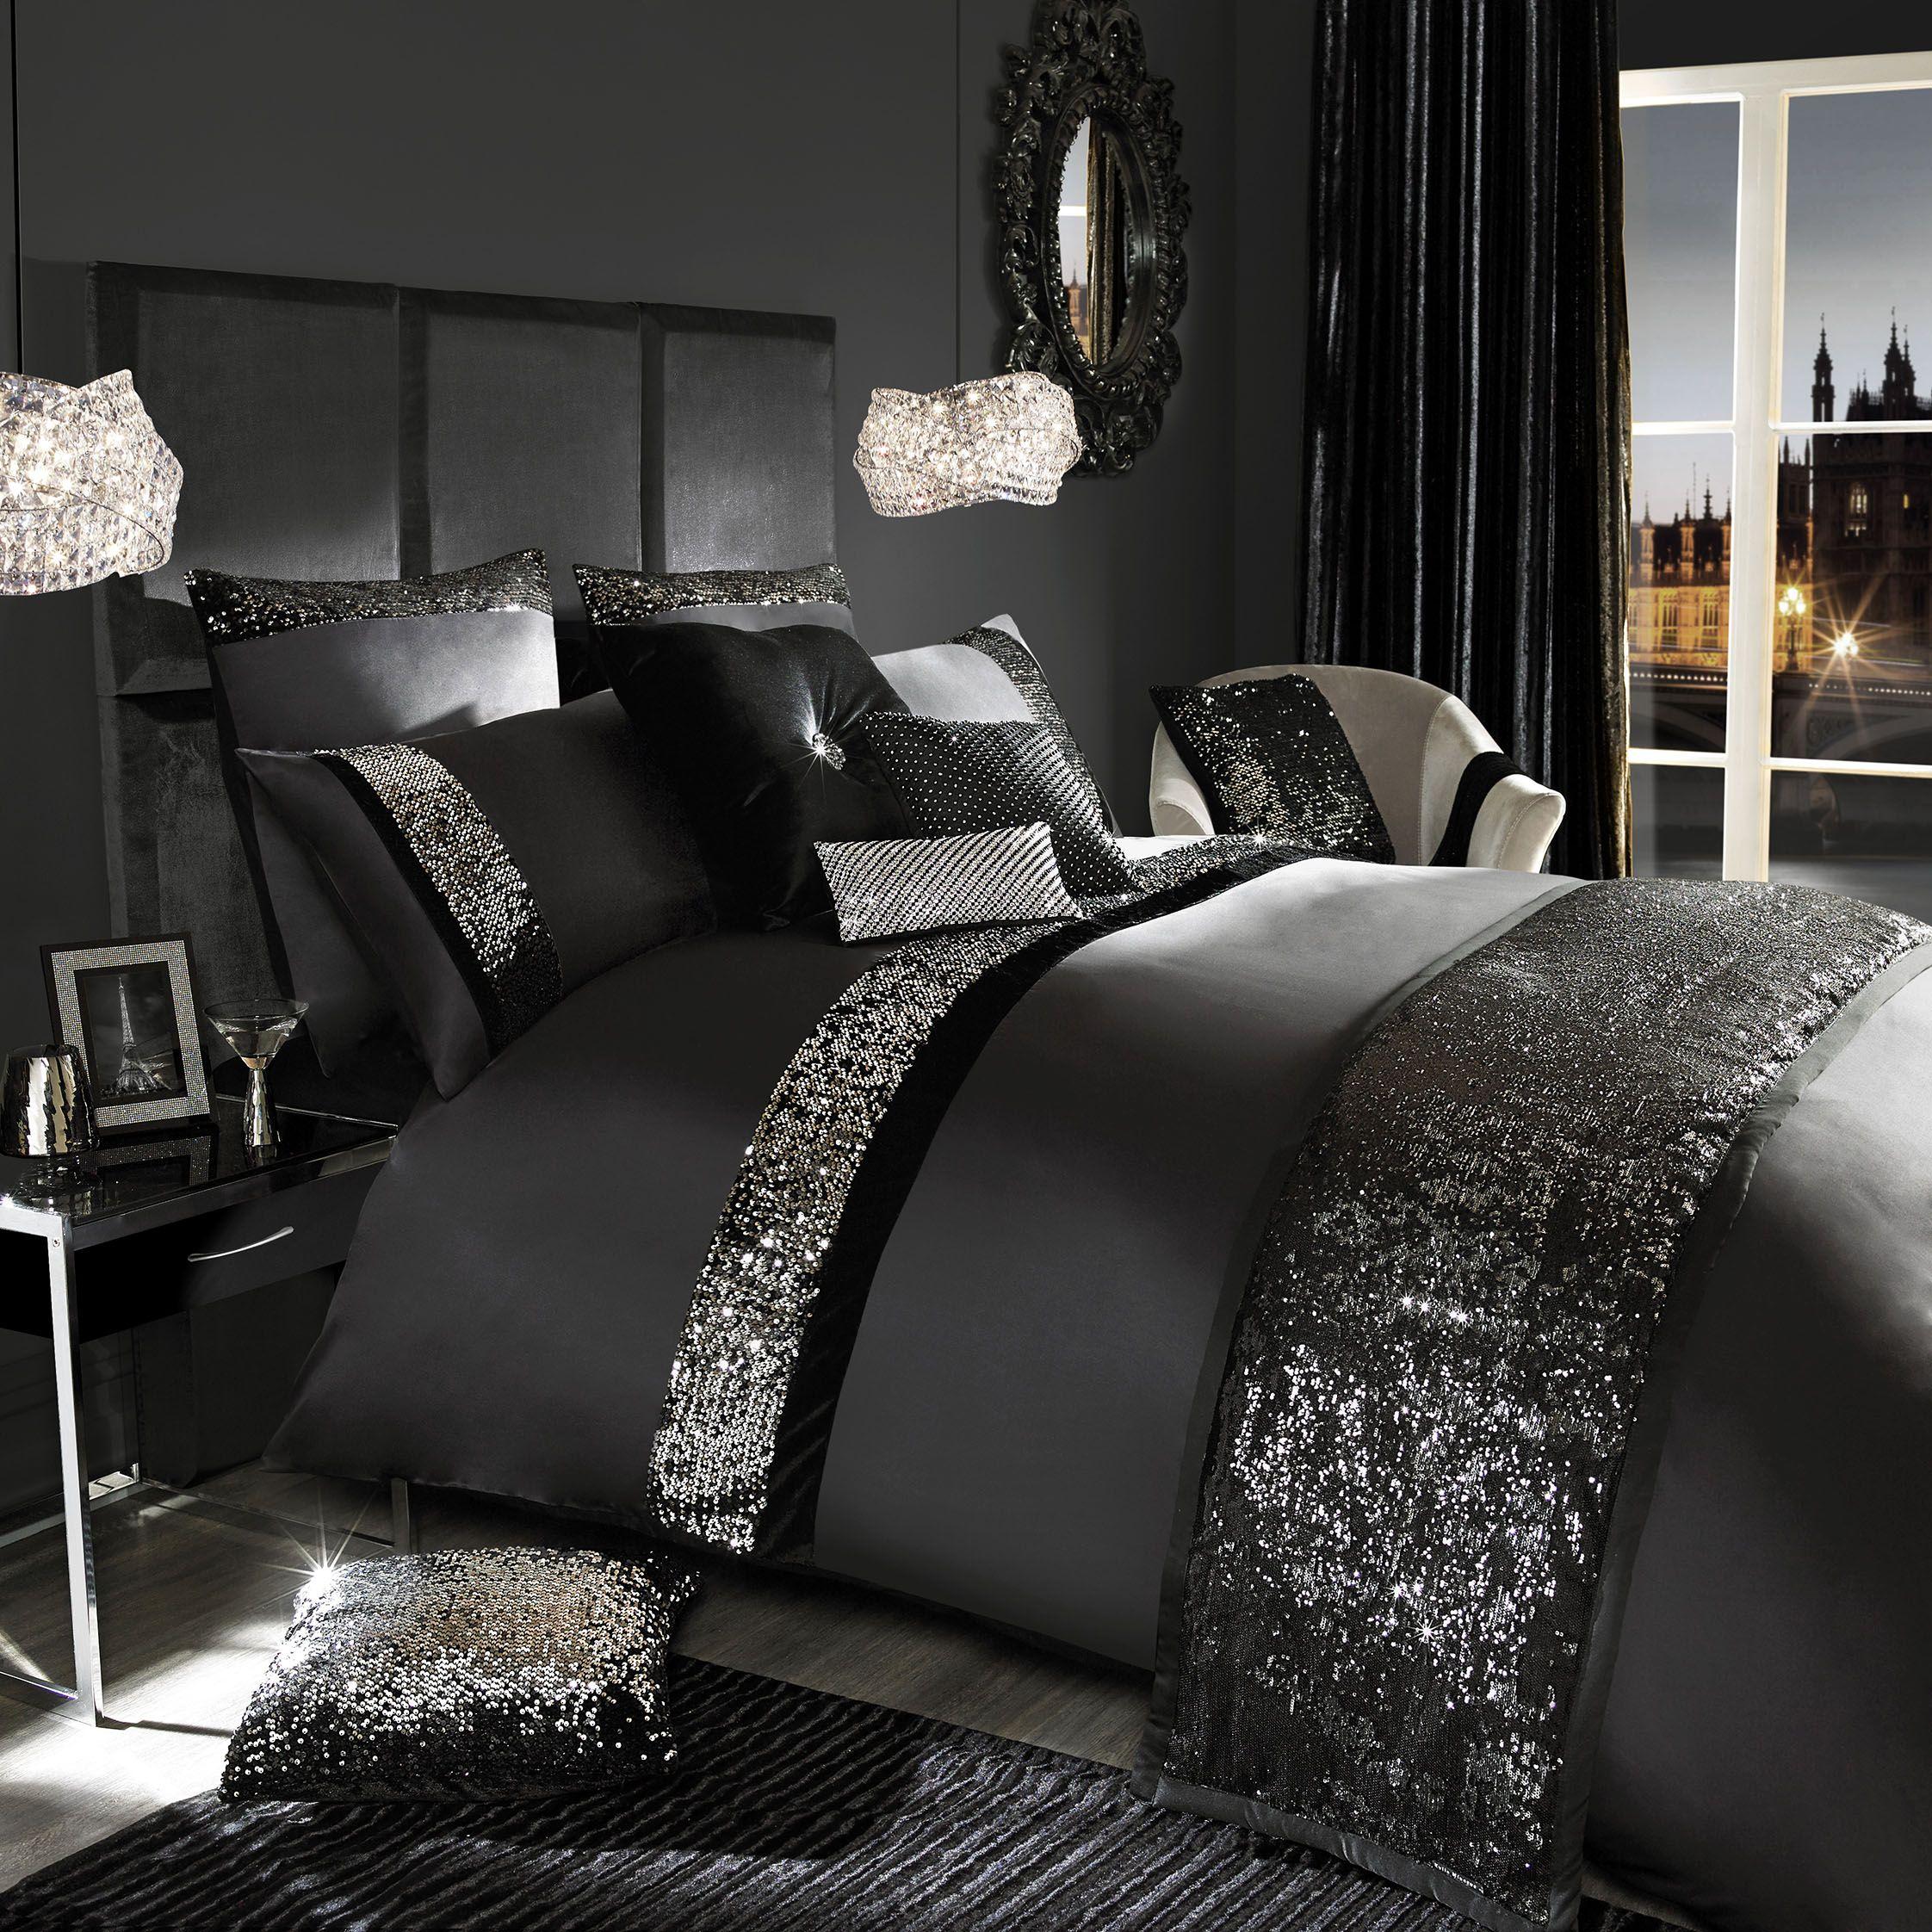 kylie minogue bedding velvetina black bedsblack